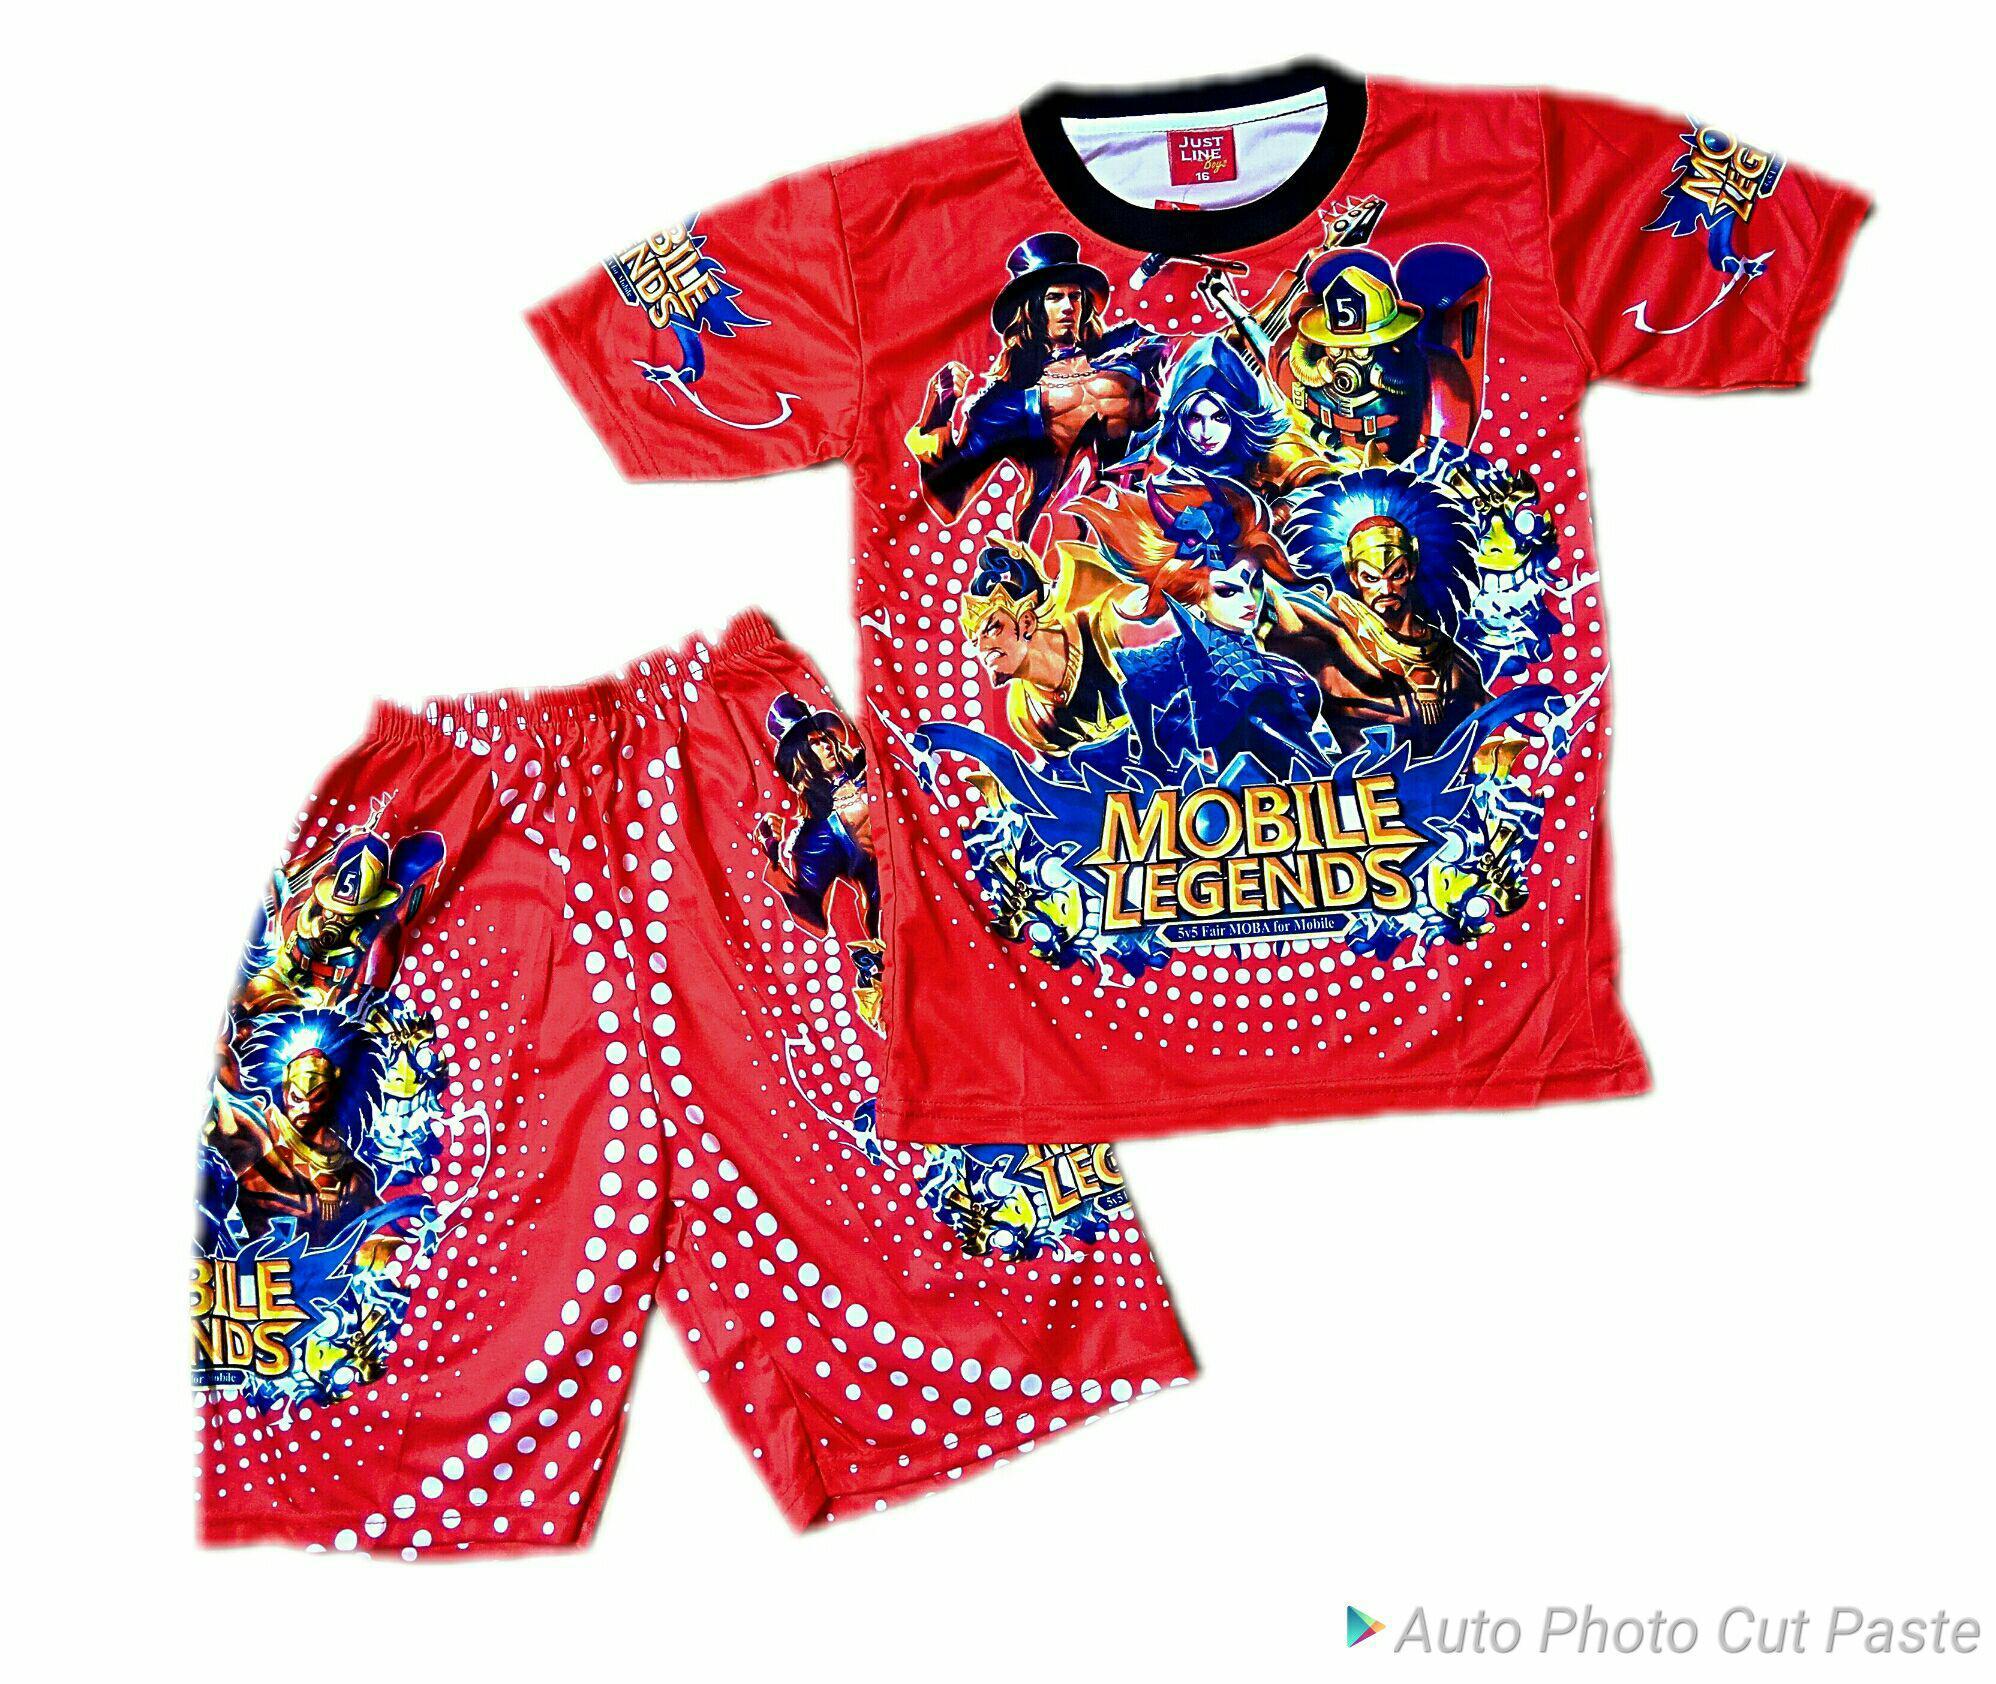 Full print setelan mobile legend 2 10 thn · LOKAL APPAREL Pakaian Anak Laki laki